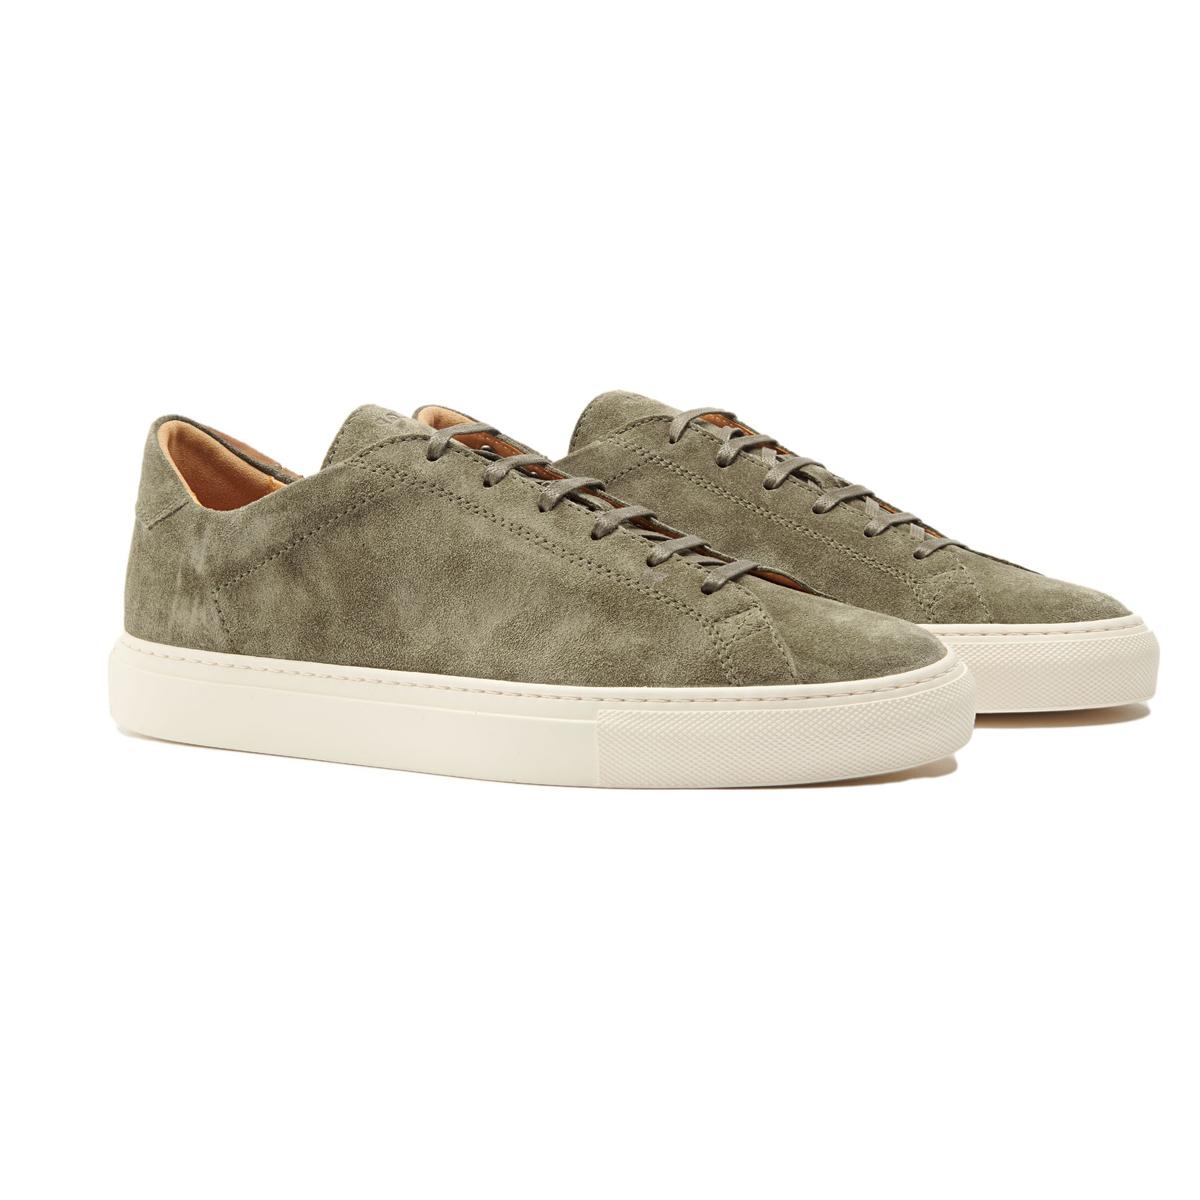 C.QP Gridiron Green Racquet Sr Sneakers